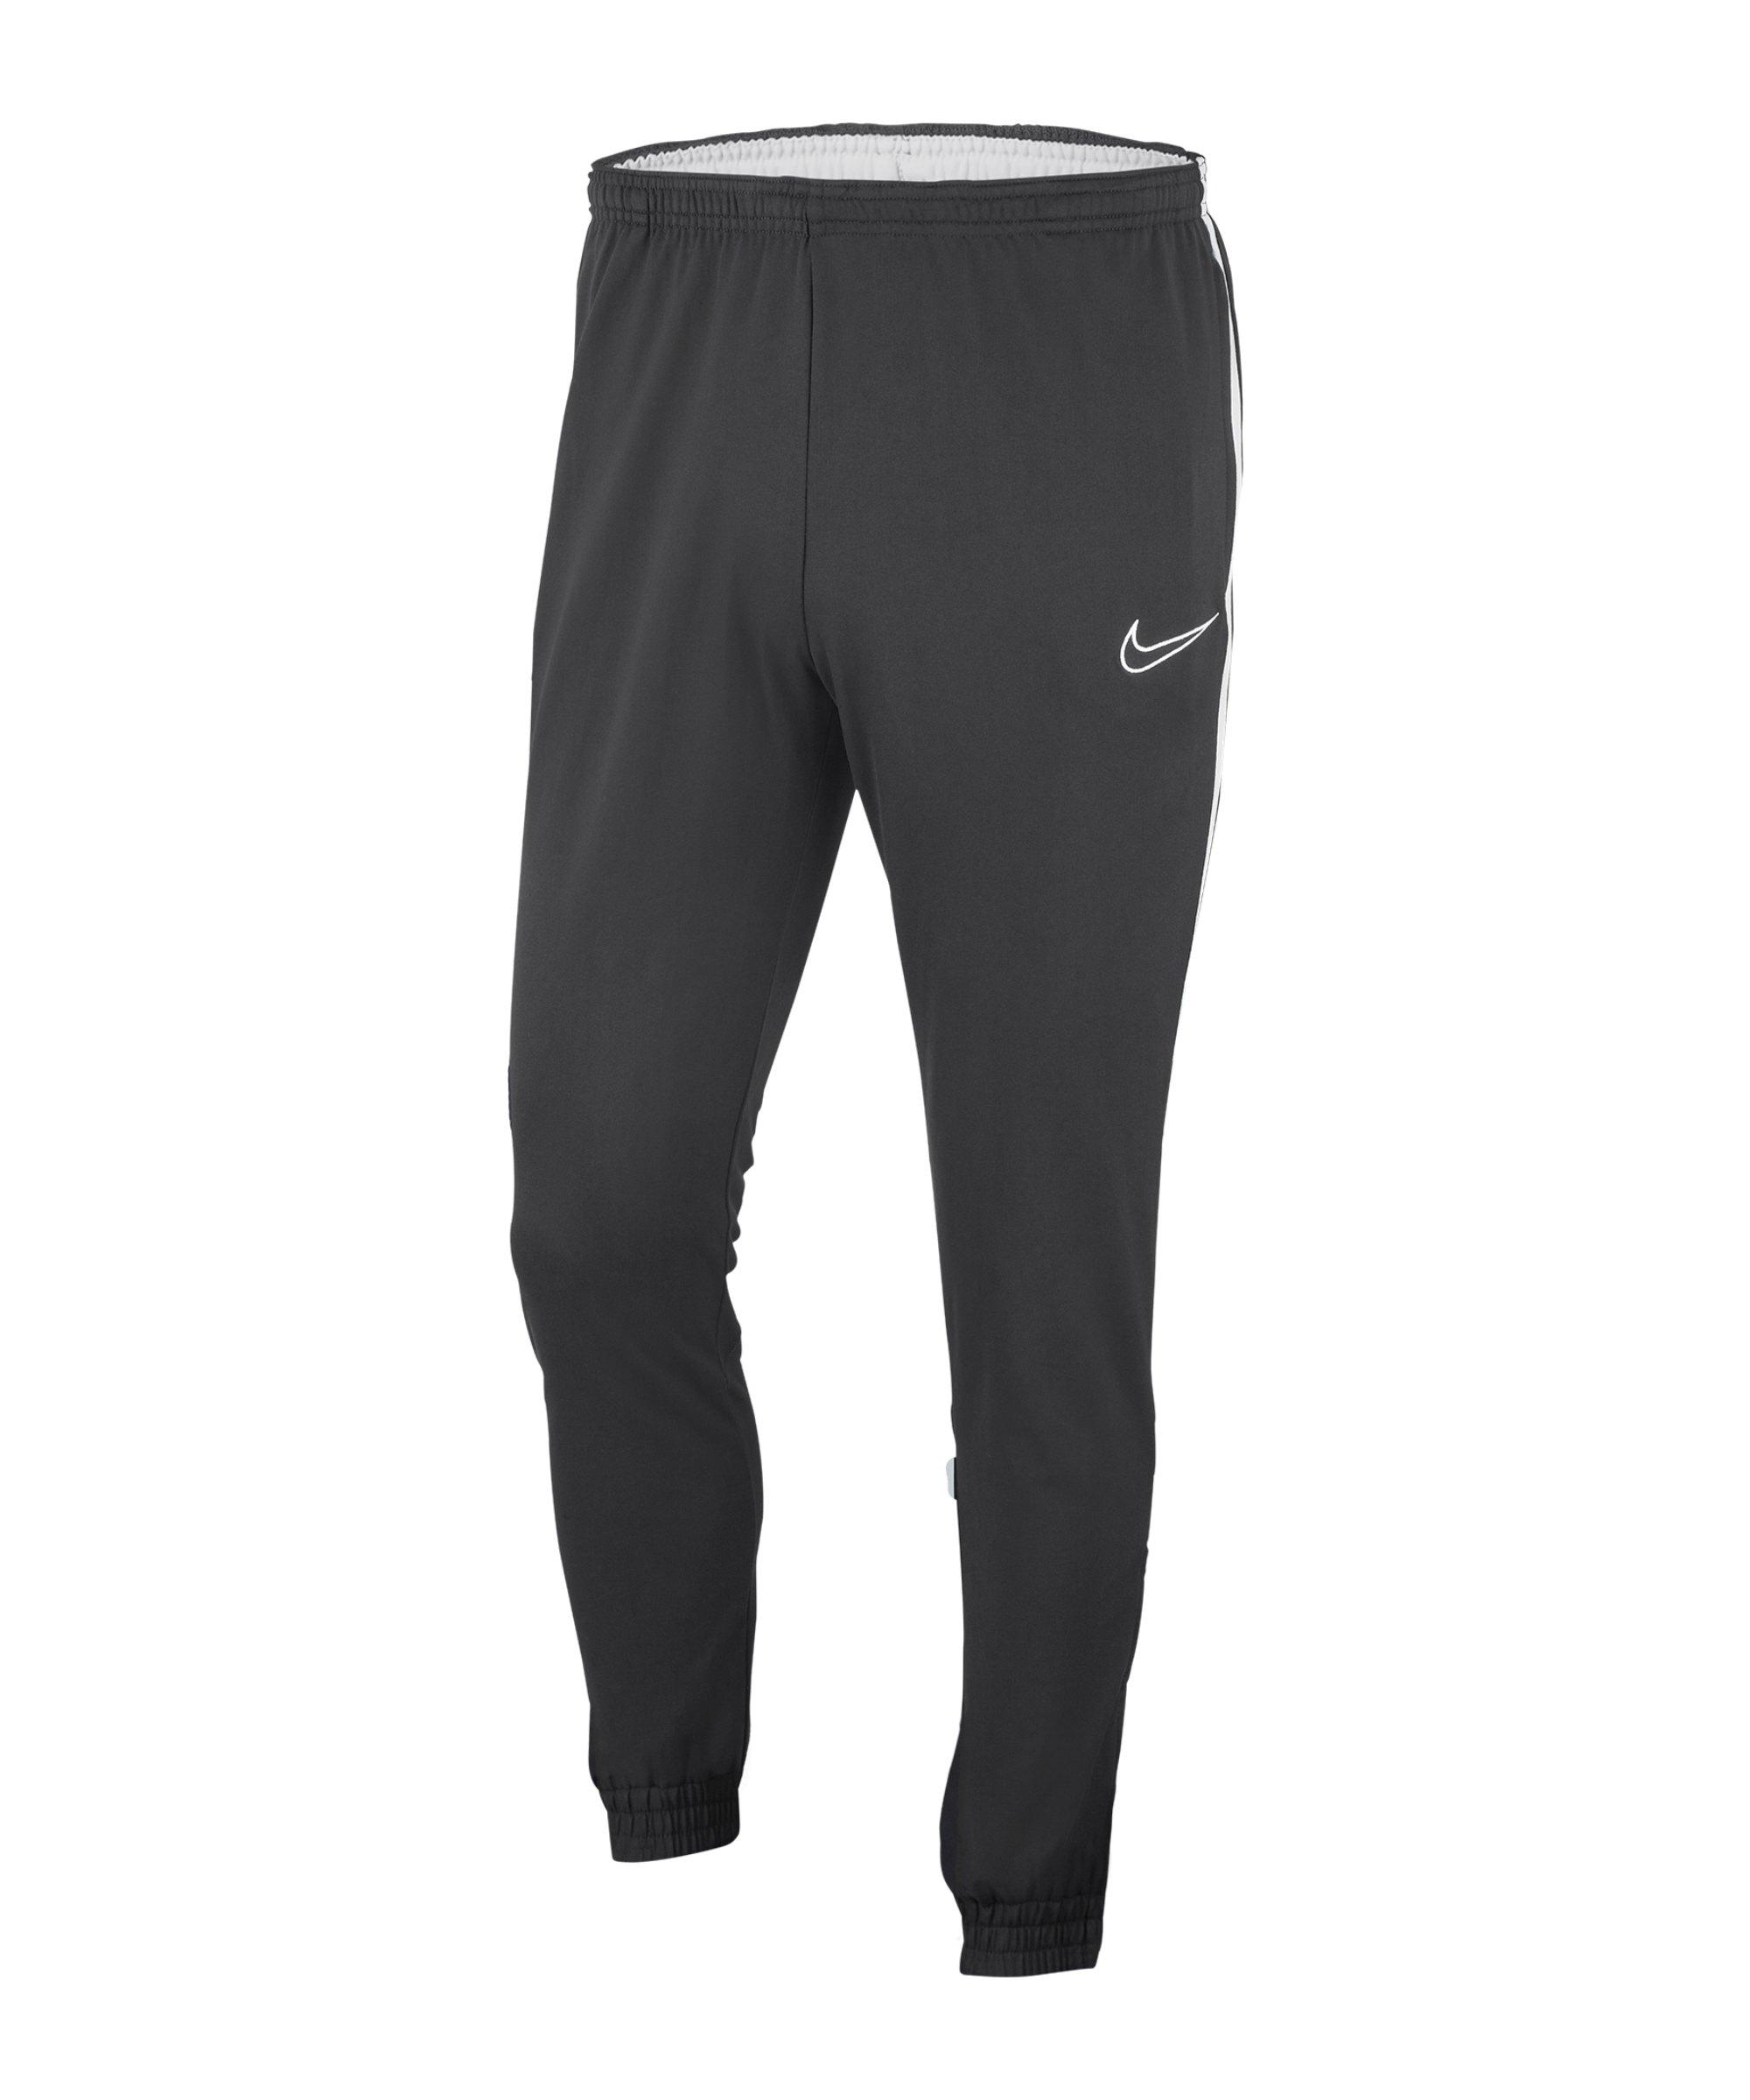 Nike Academy 19 Woven Präsentationshose Grau F060 - grau